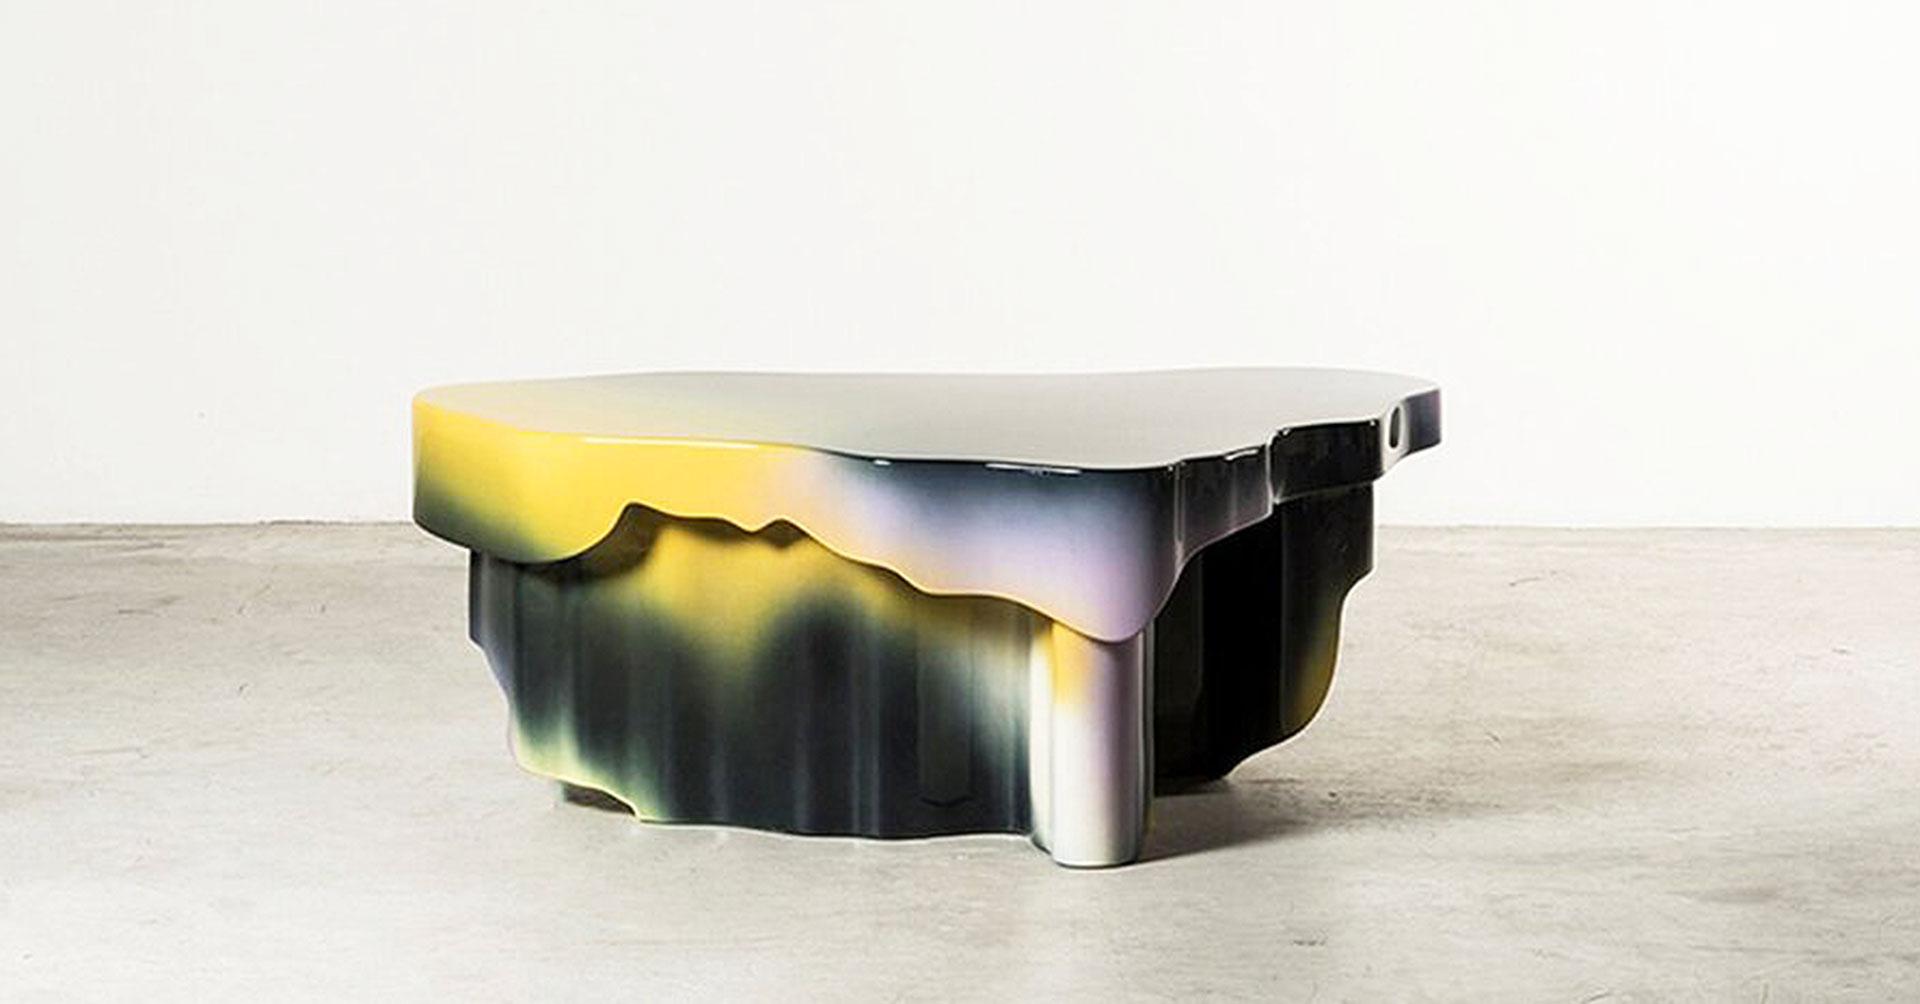 Тренды 2020/2021: противоестественный дизайн Odd Matter